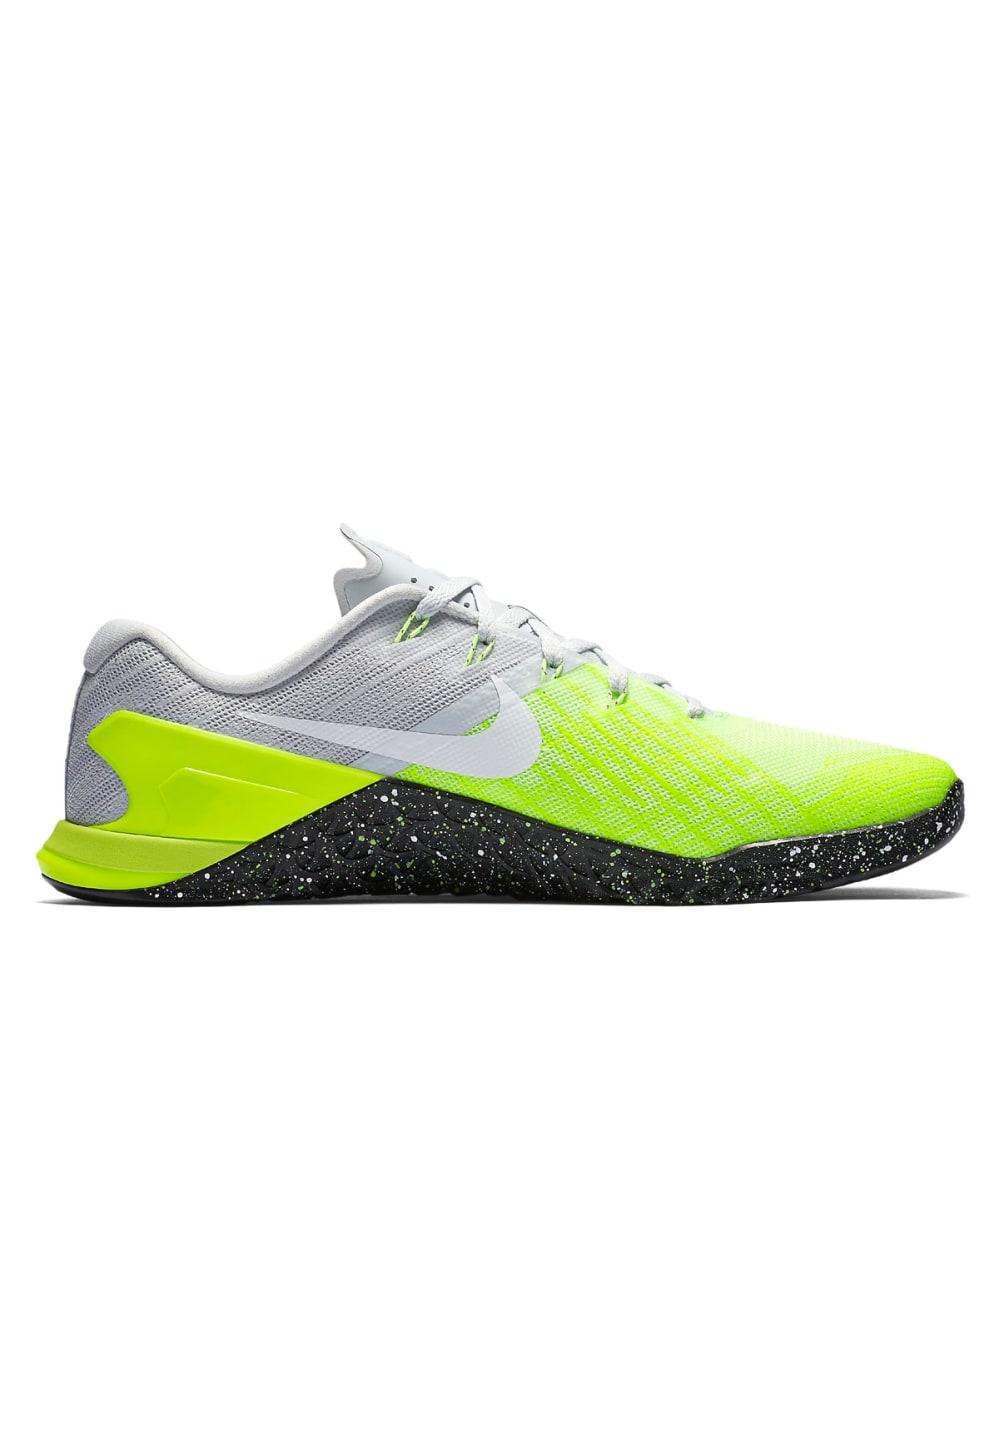 3 Para Hombre Metcon Zapatillas Gris Fitness Nike De BCthdxsQr